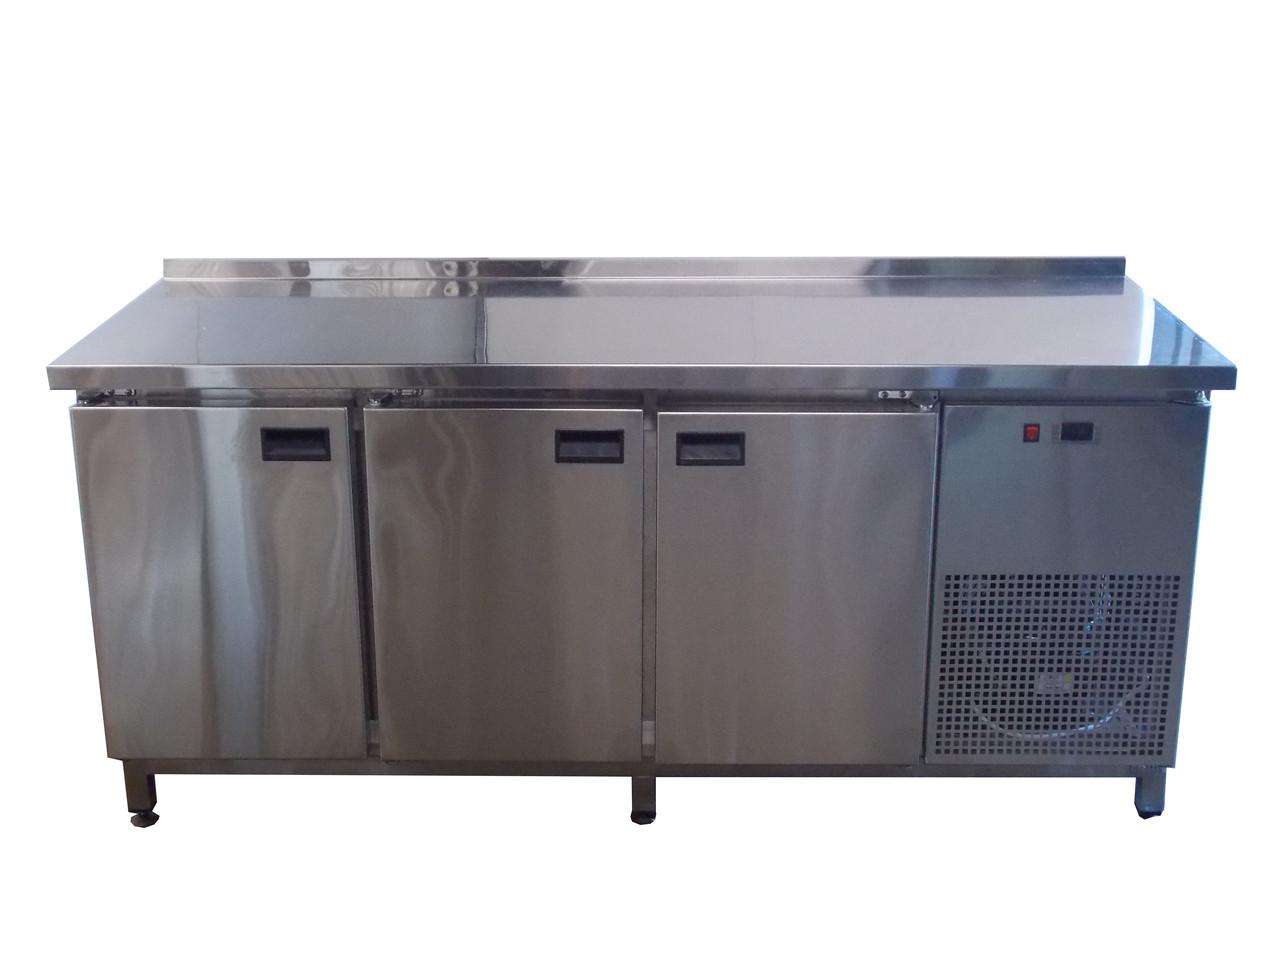 Холодильний стіл 3-х дверний Tehma (1860*700*850)